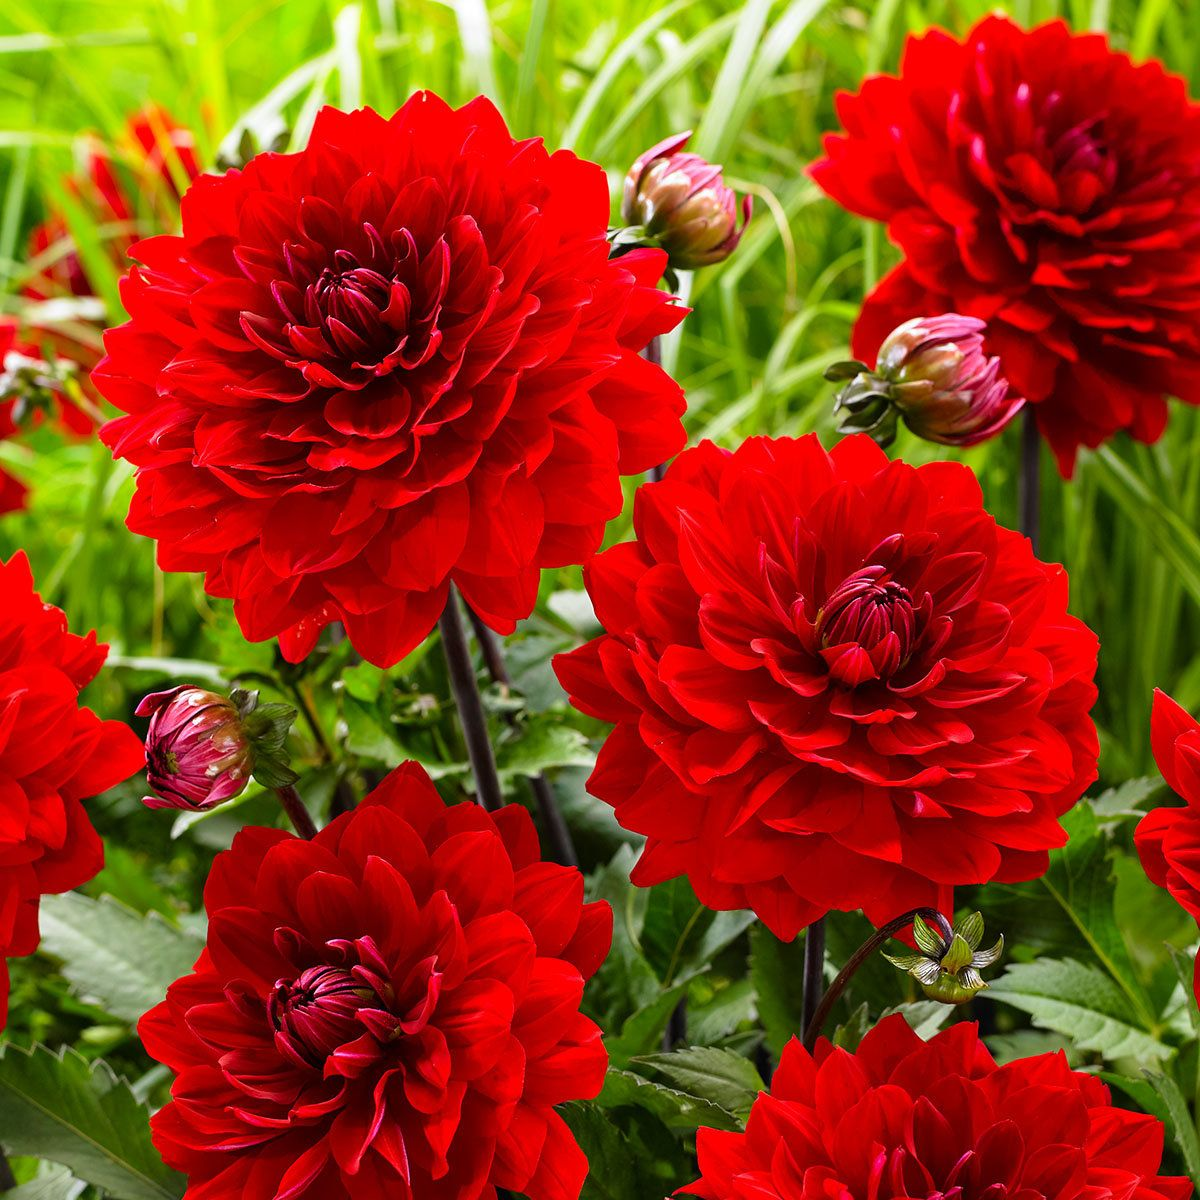 Schmuckdahlie Karma Amora Online Kaufen Bei Gartner Potschke Dahlia Flowers Rock Garden